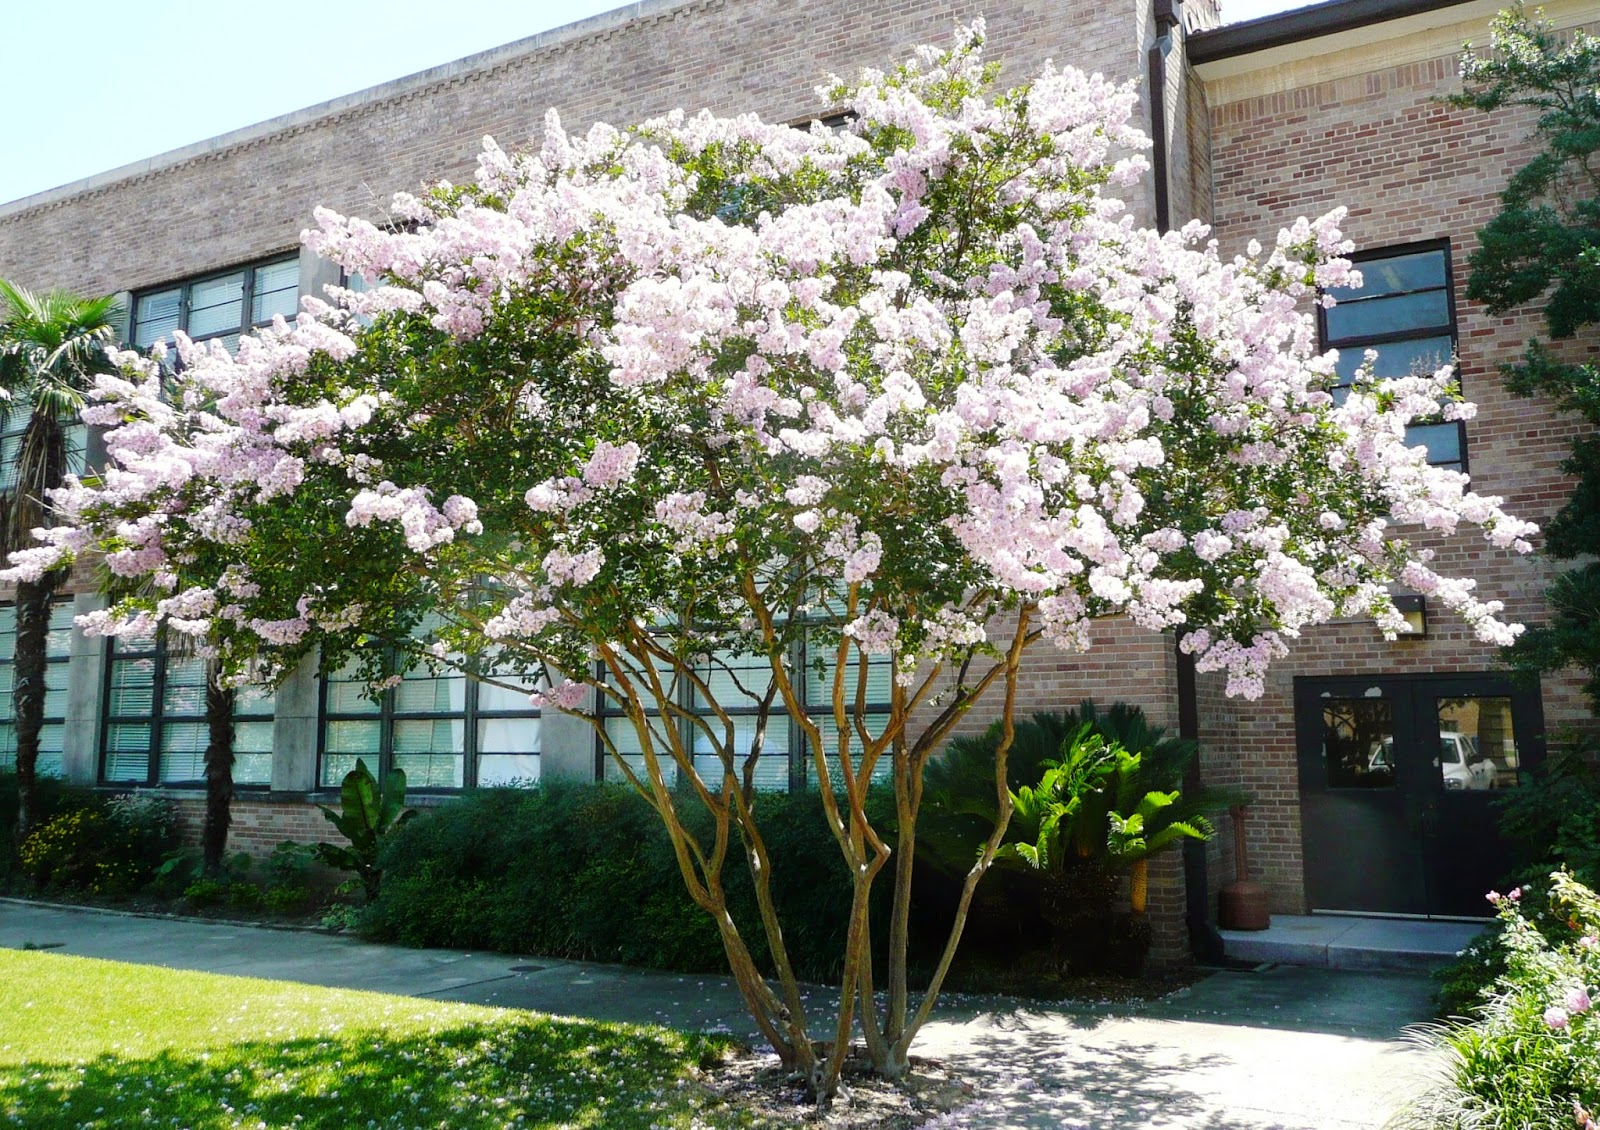 Allergena texas trees crape myrtle beautifully flowering trees crape myrtle trees for allergy suffers nvjuhfo Choice Image